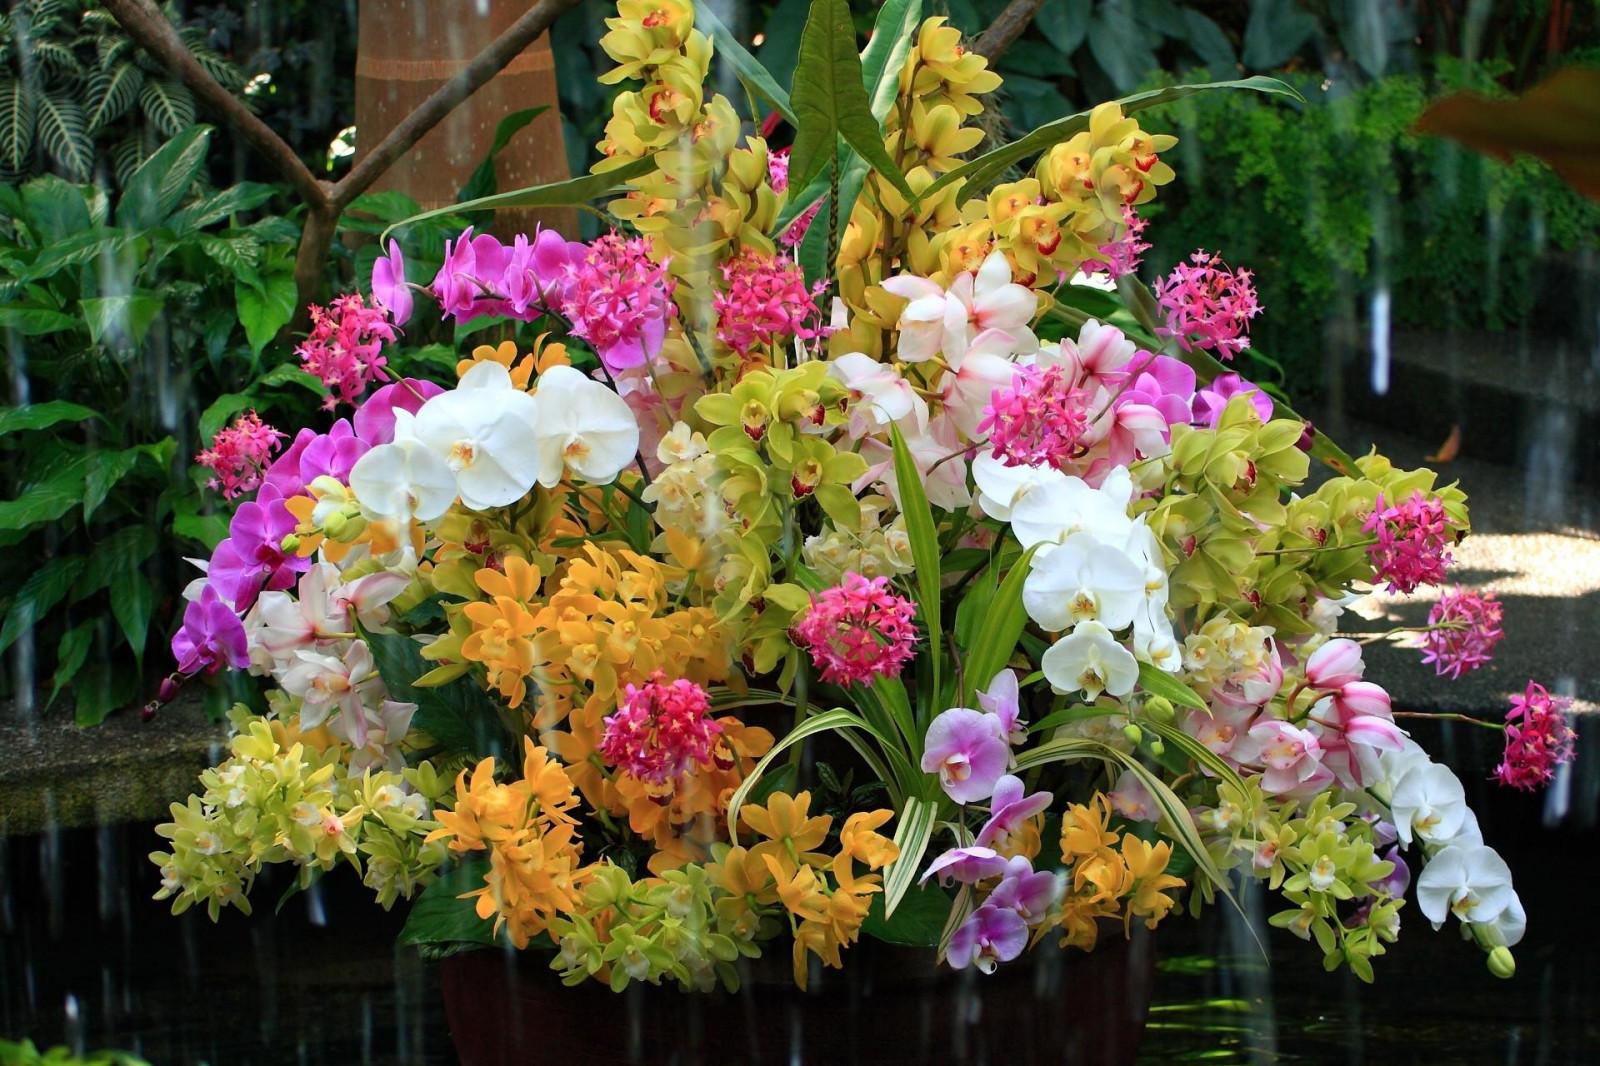 Хочу харчо! - Страница 3 Orchids_flowers_flower_water_exotic-683252